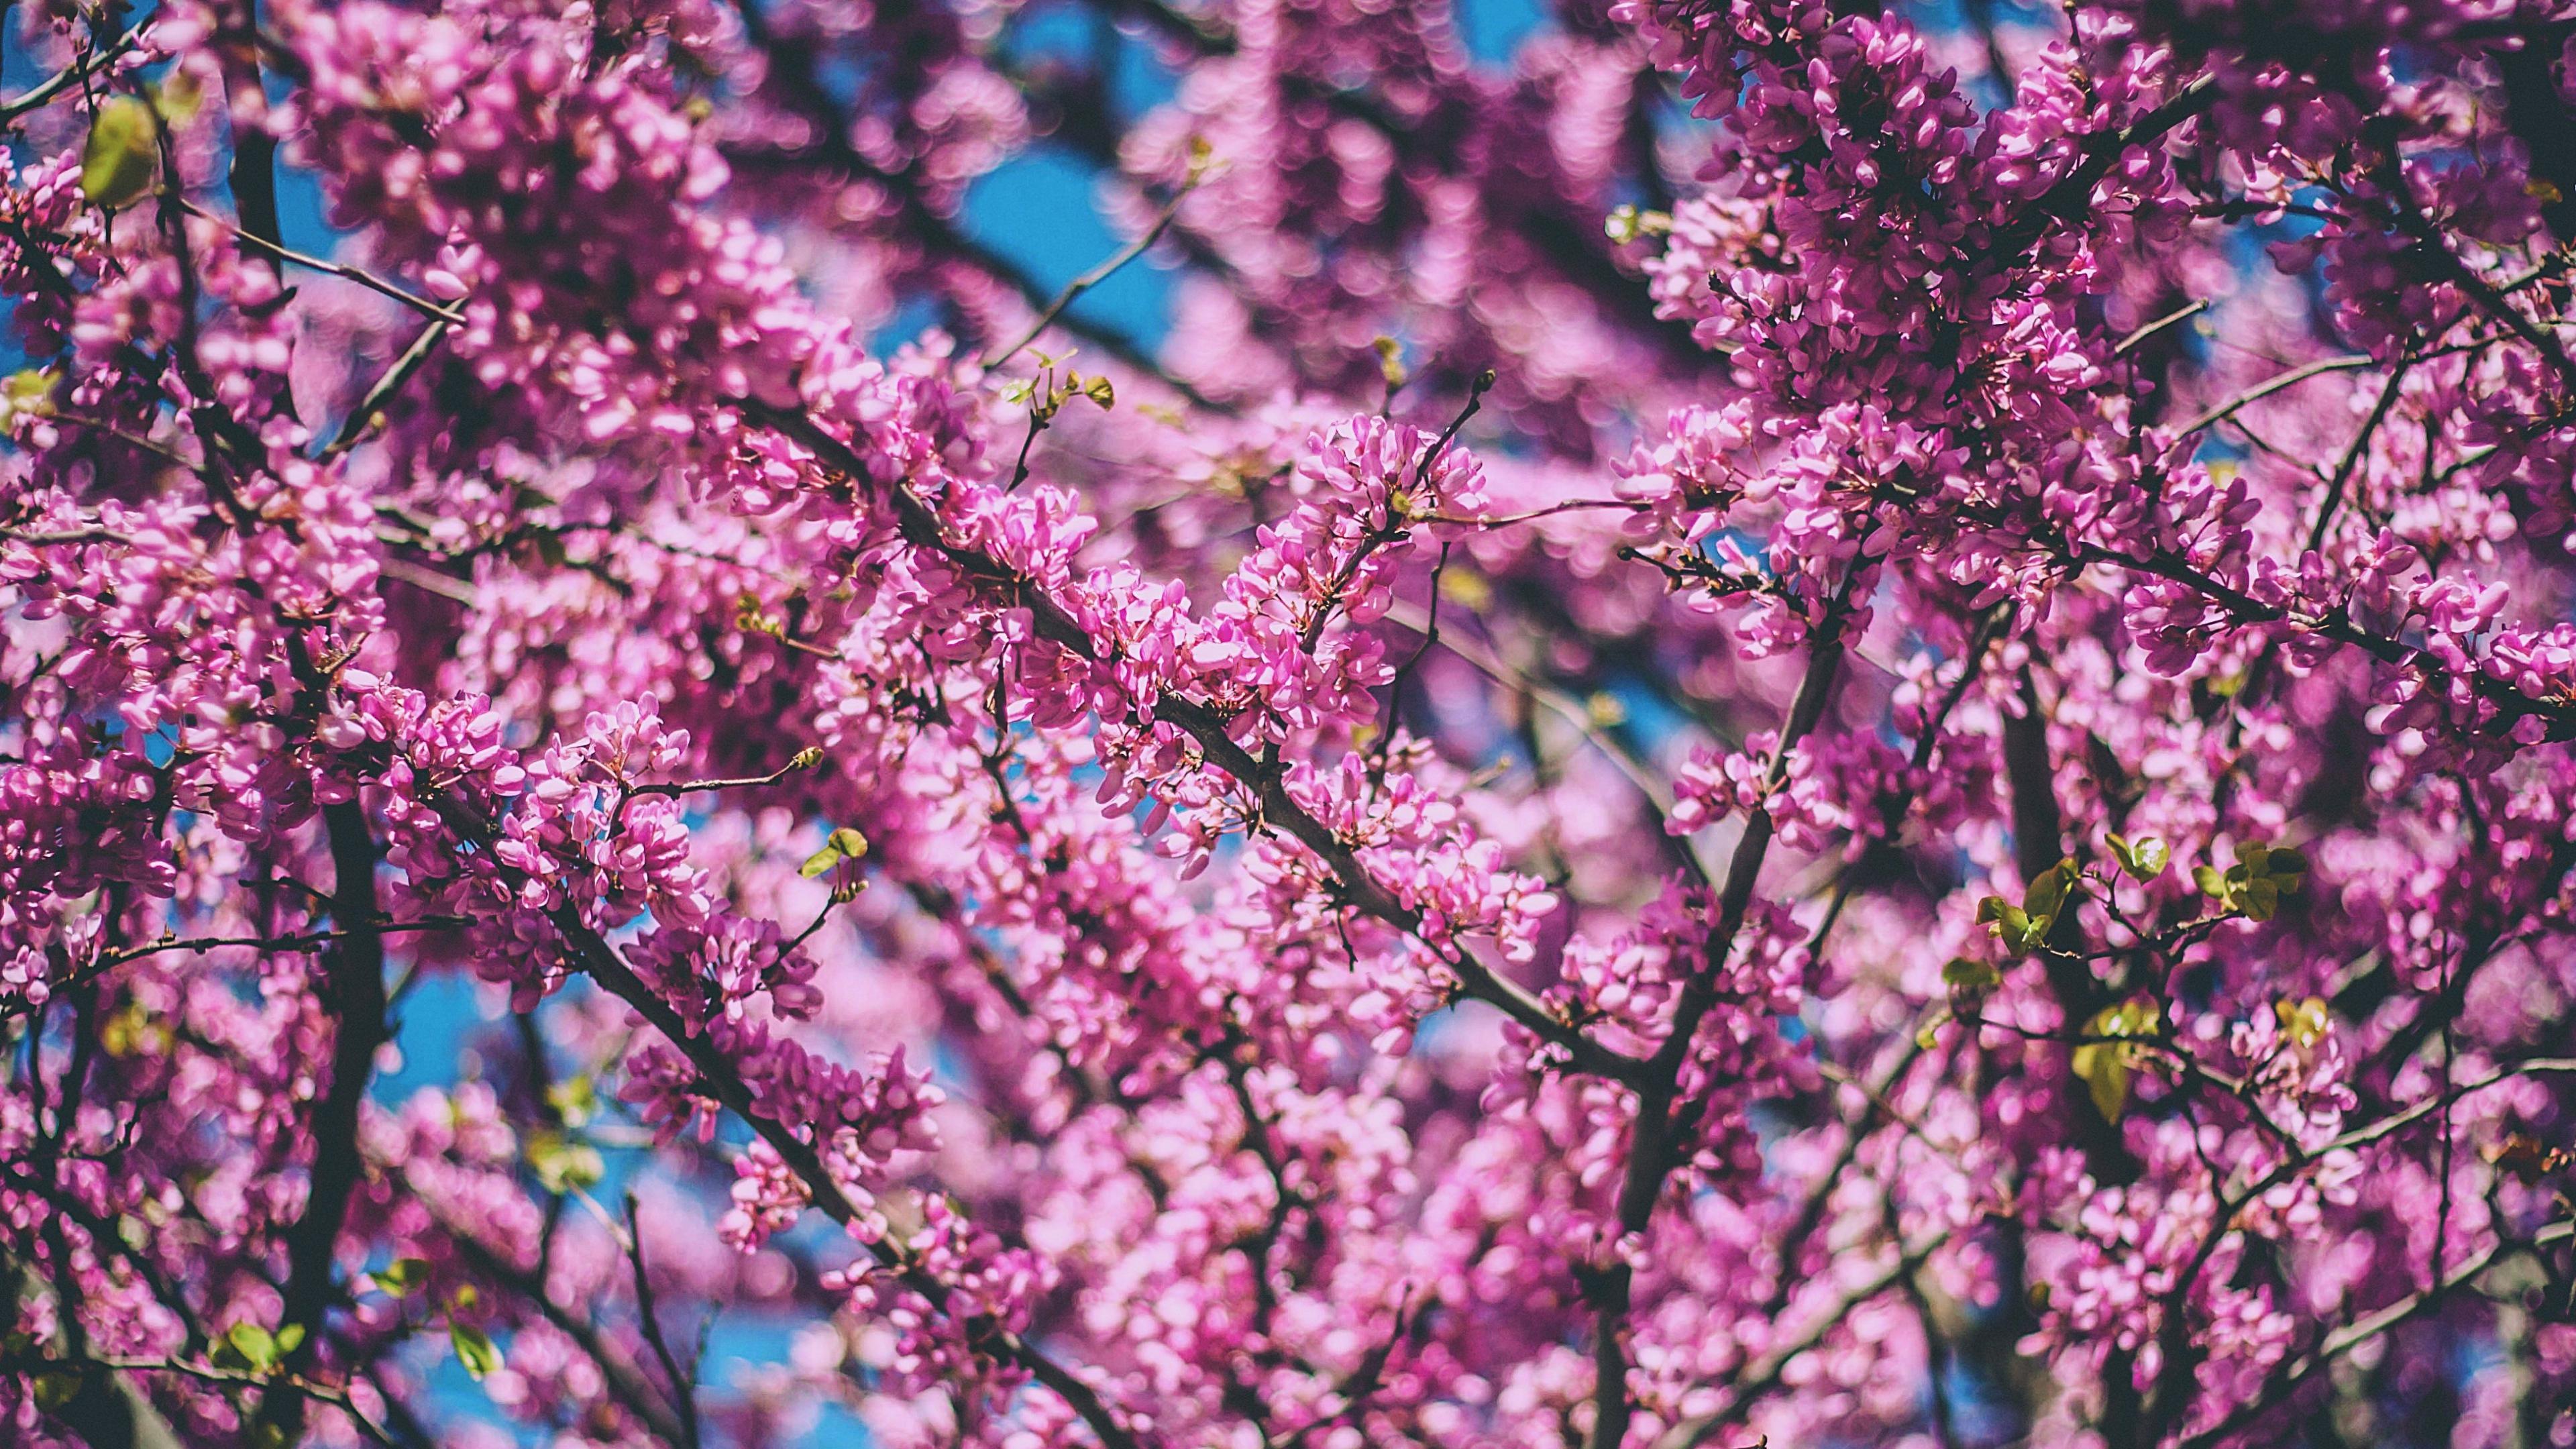 cherry flowers pink 4k 1606508861 - Cherry Flowers Pink 4k - Cherry Flowers Pink 4k wallpapers